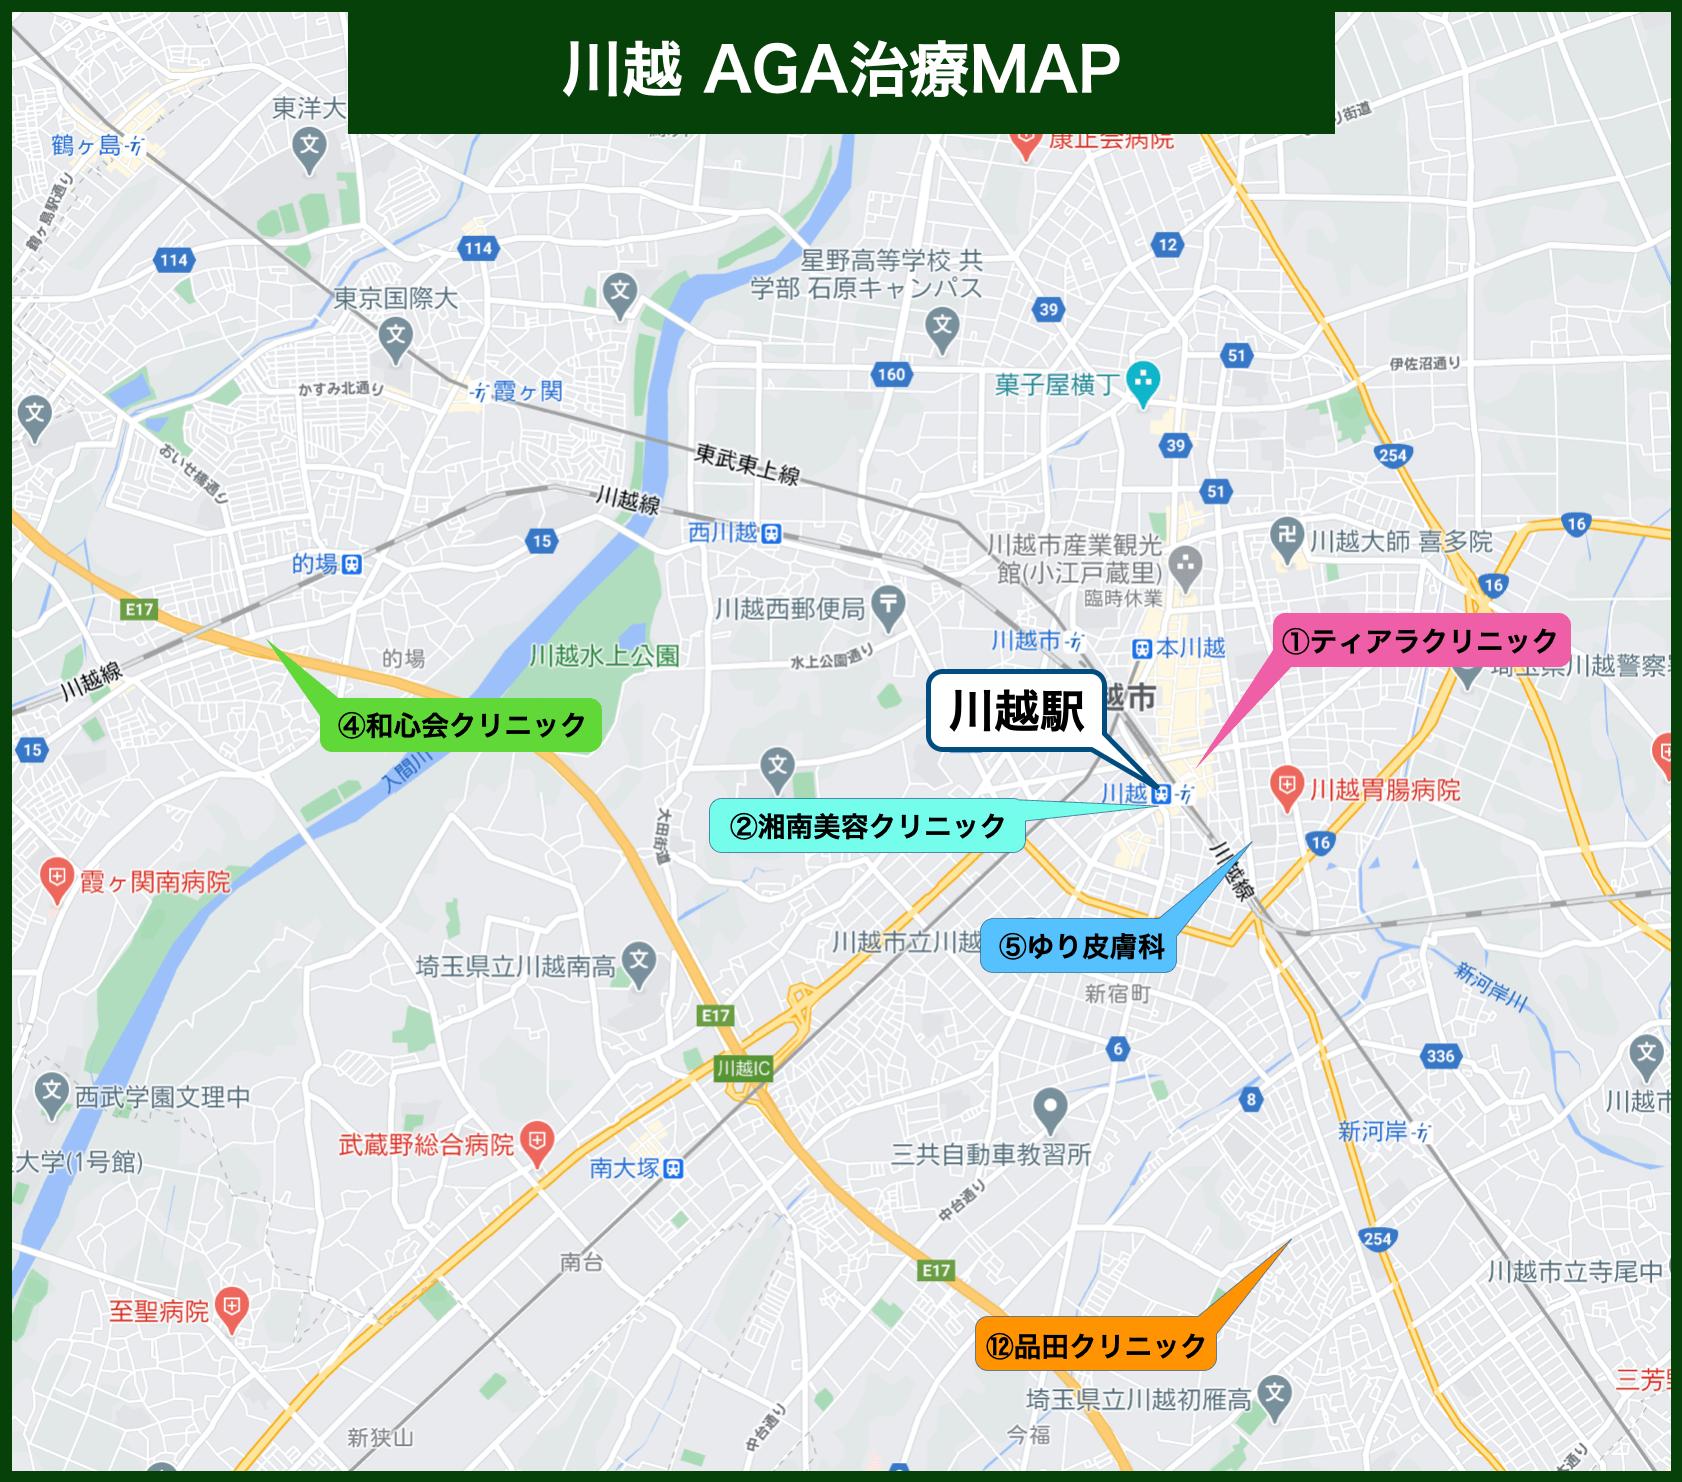 川越 AGA治療MAP